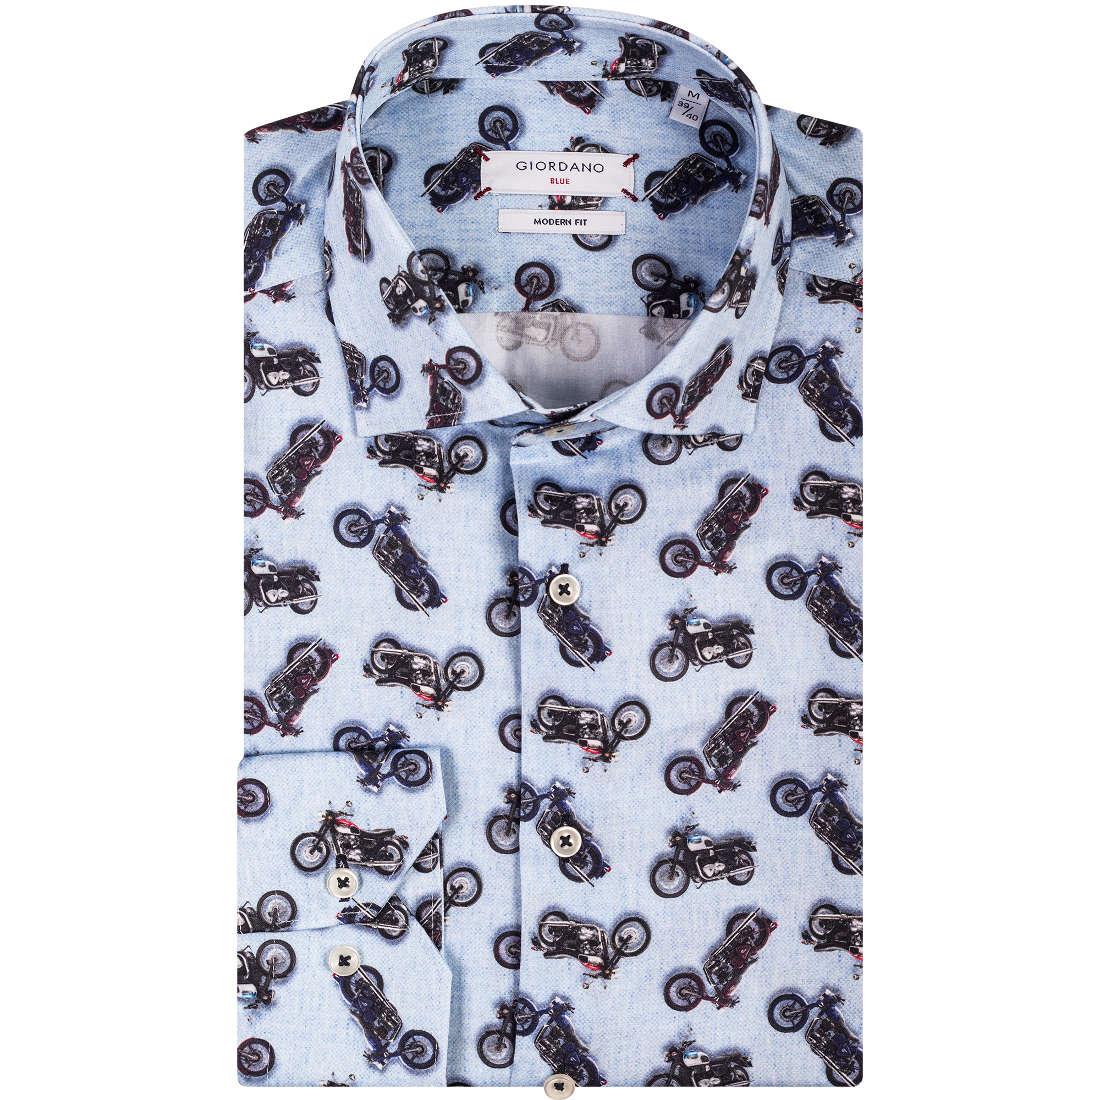 Image of Giordano overhemd Modern Fit 827509 in het Licht Blauw